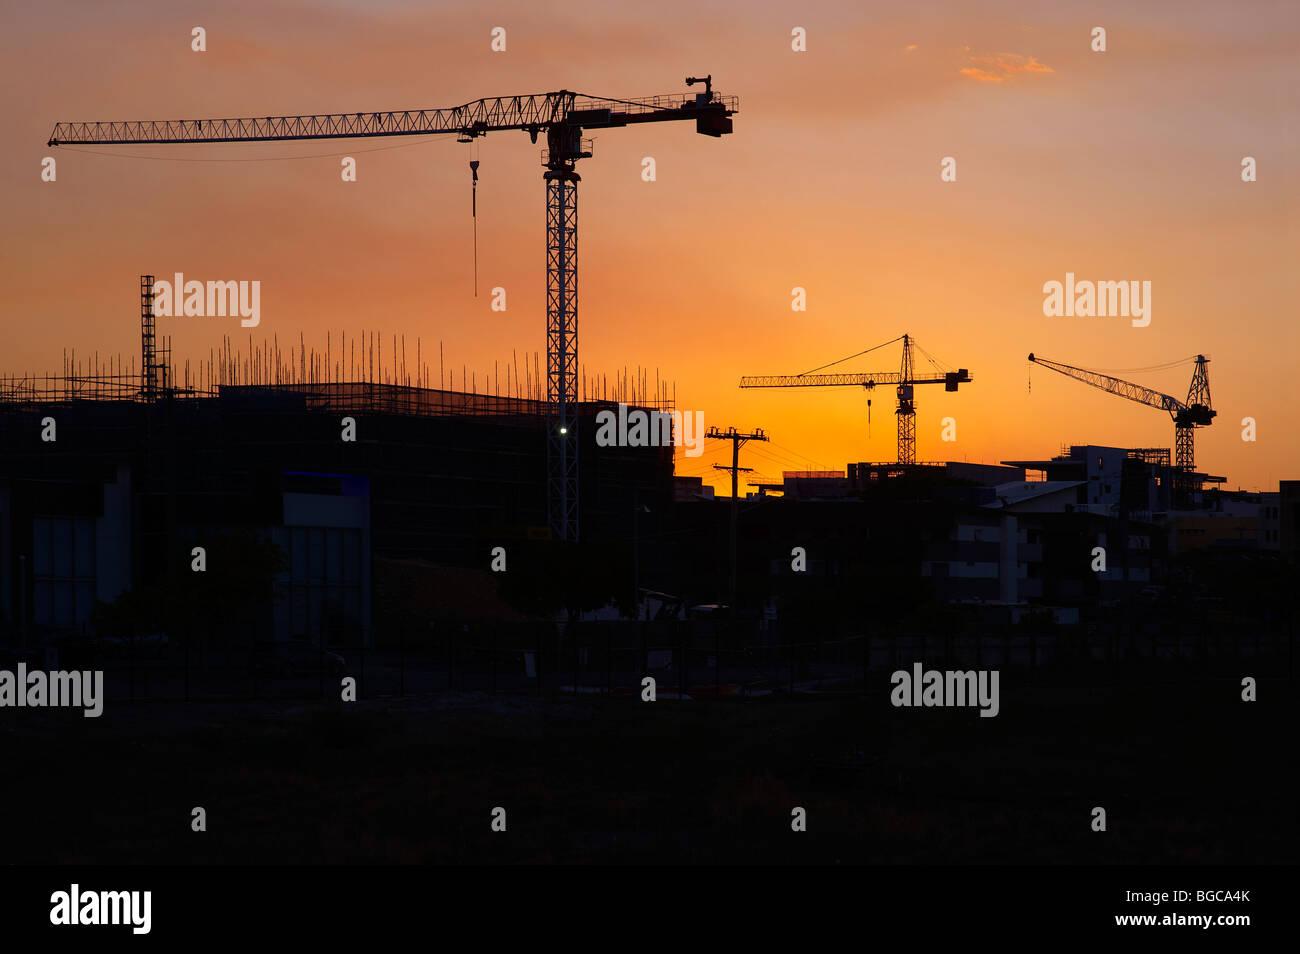 Turmdrehkrane Silhouette auf der Baustelle Stockbild